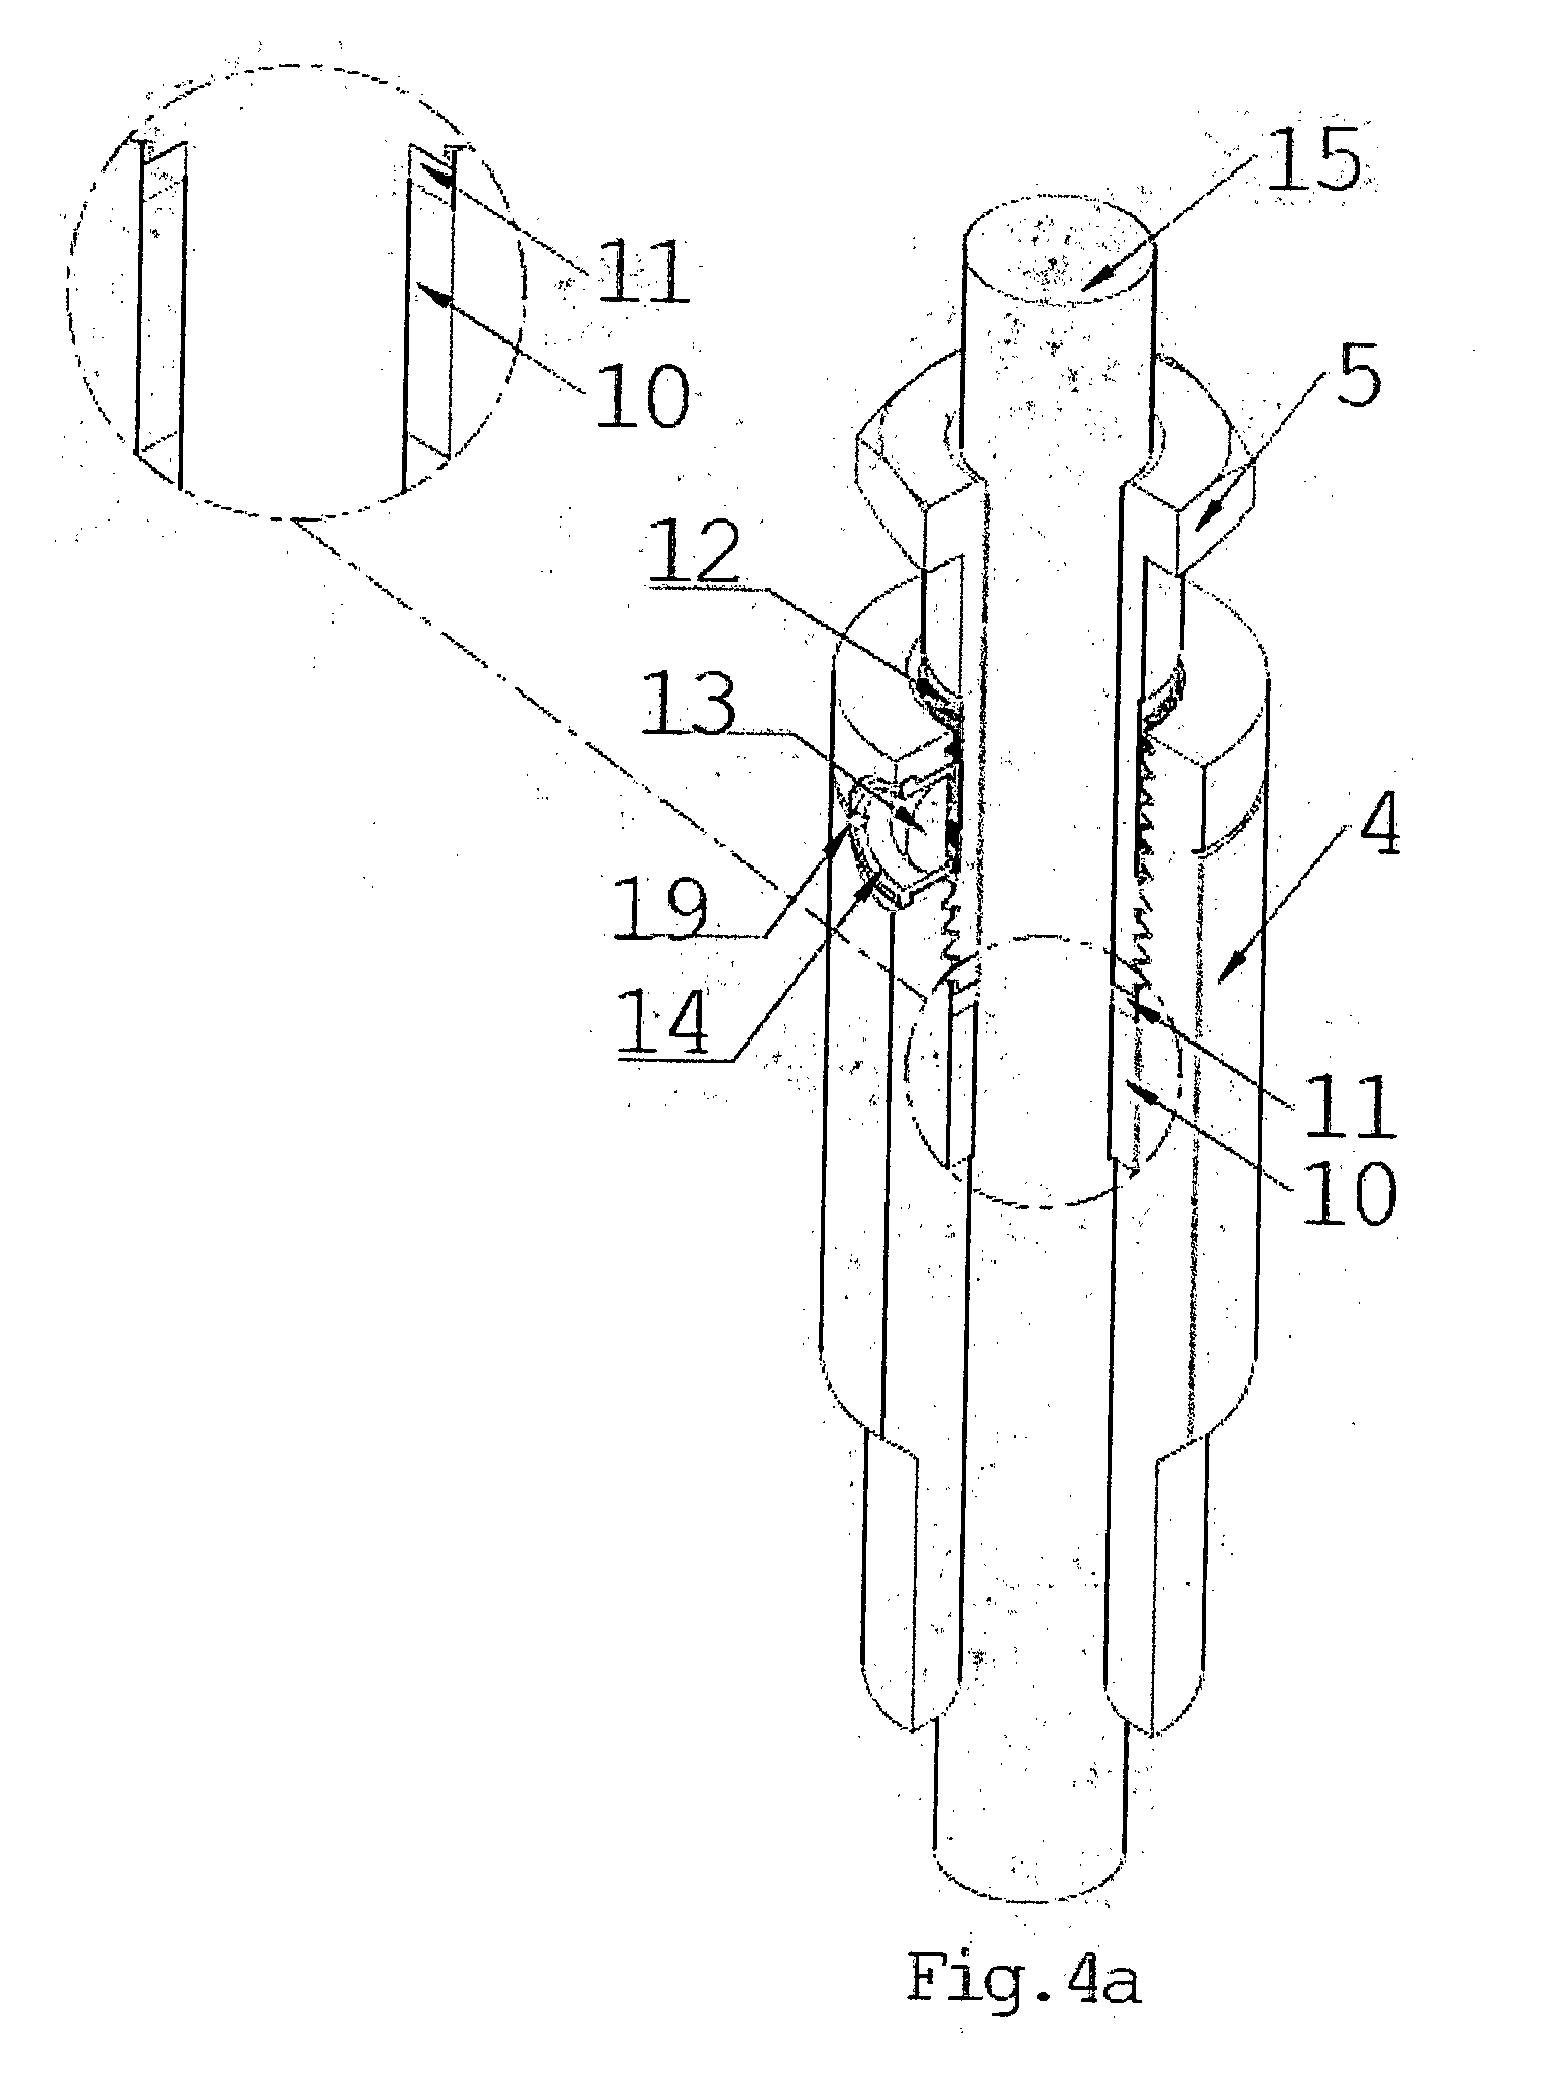 7 Pin Electric Ke Diagram, 7, Free Engine Image For User